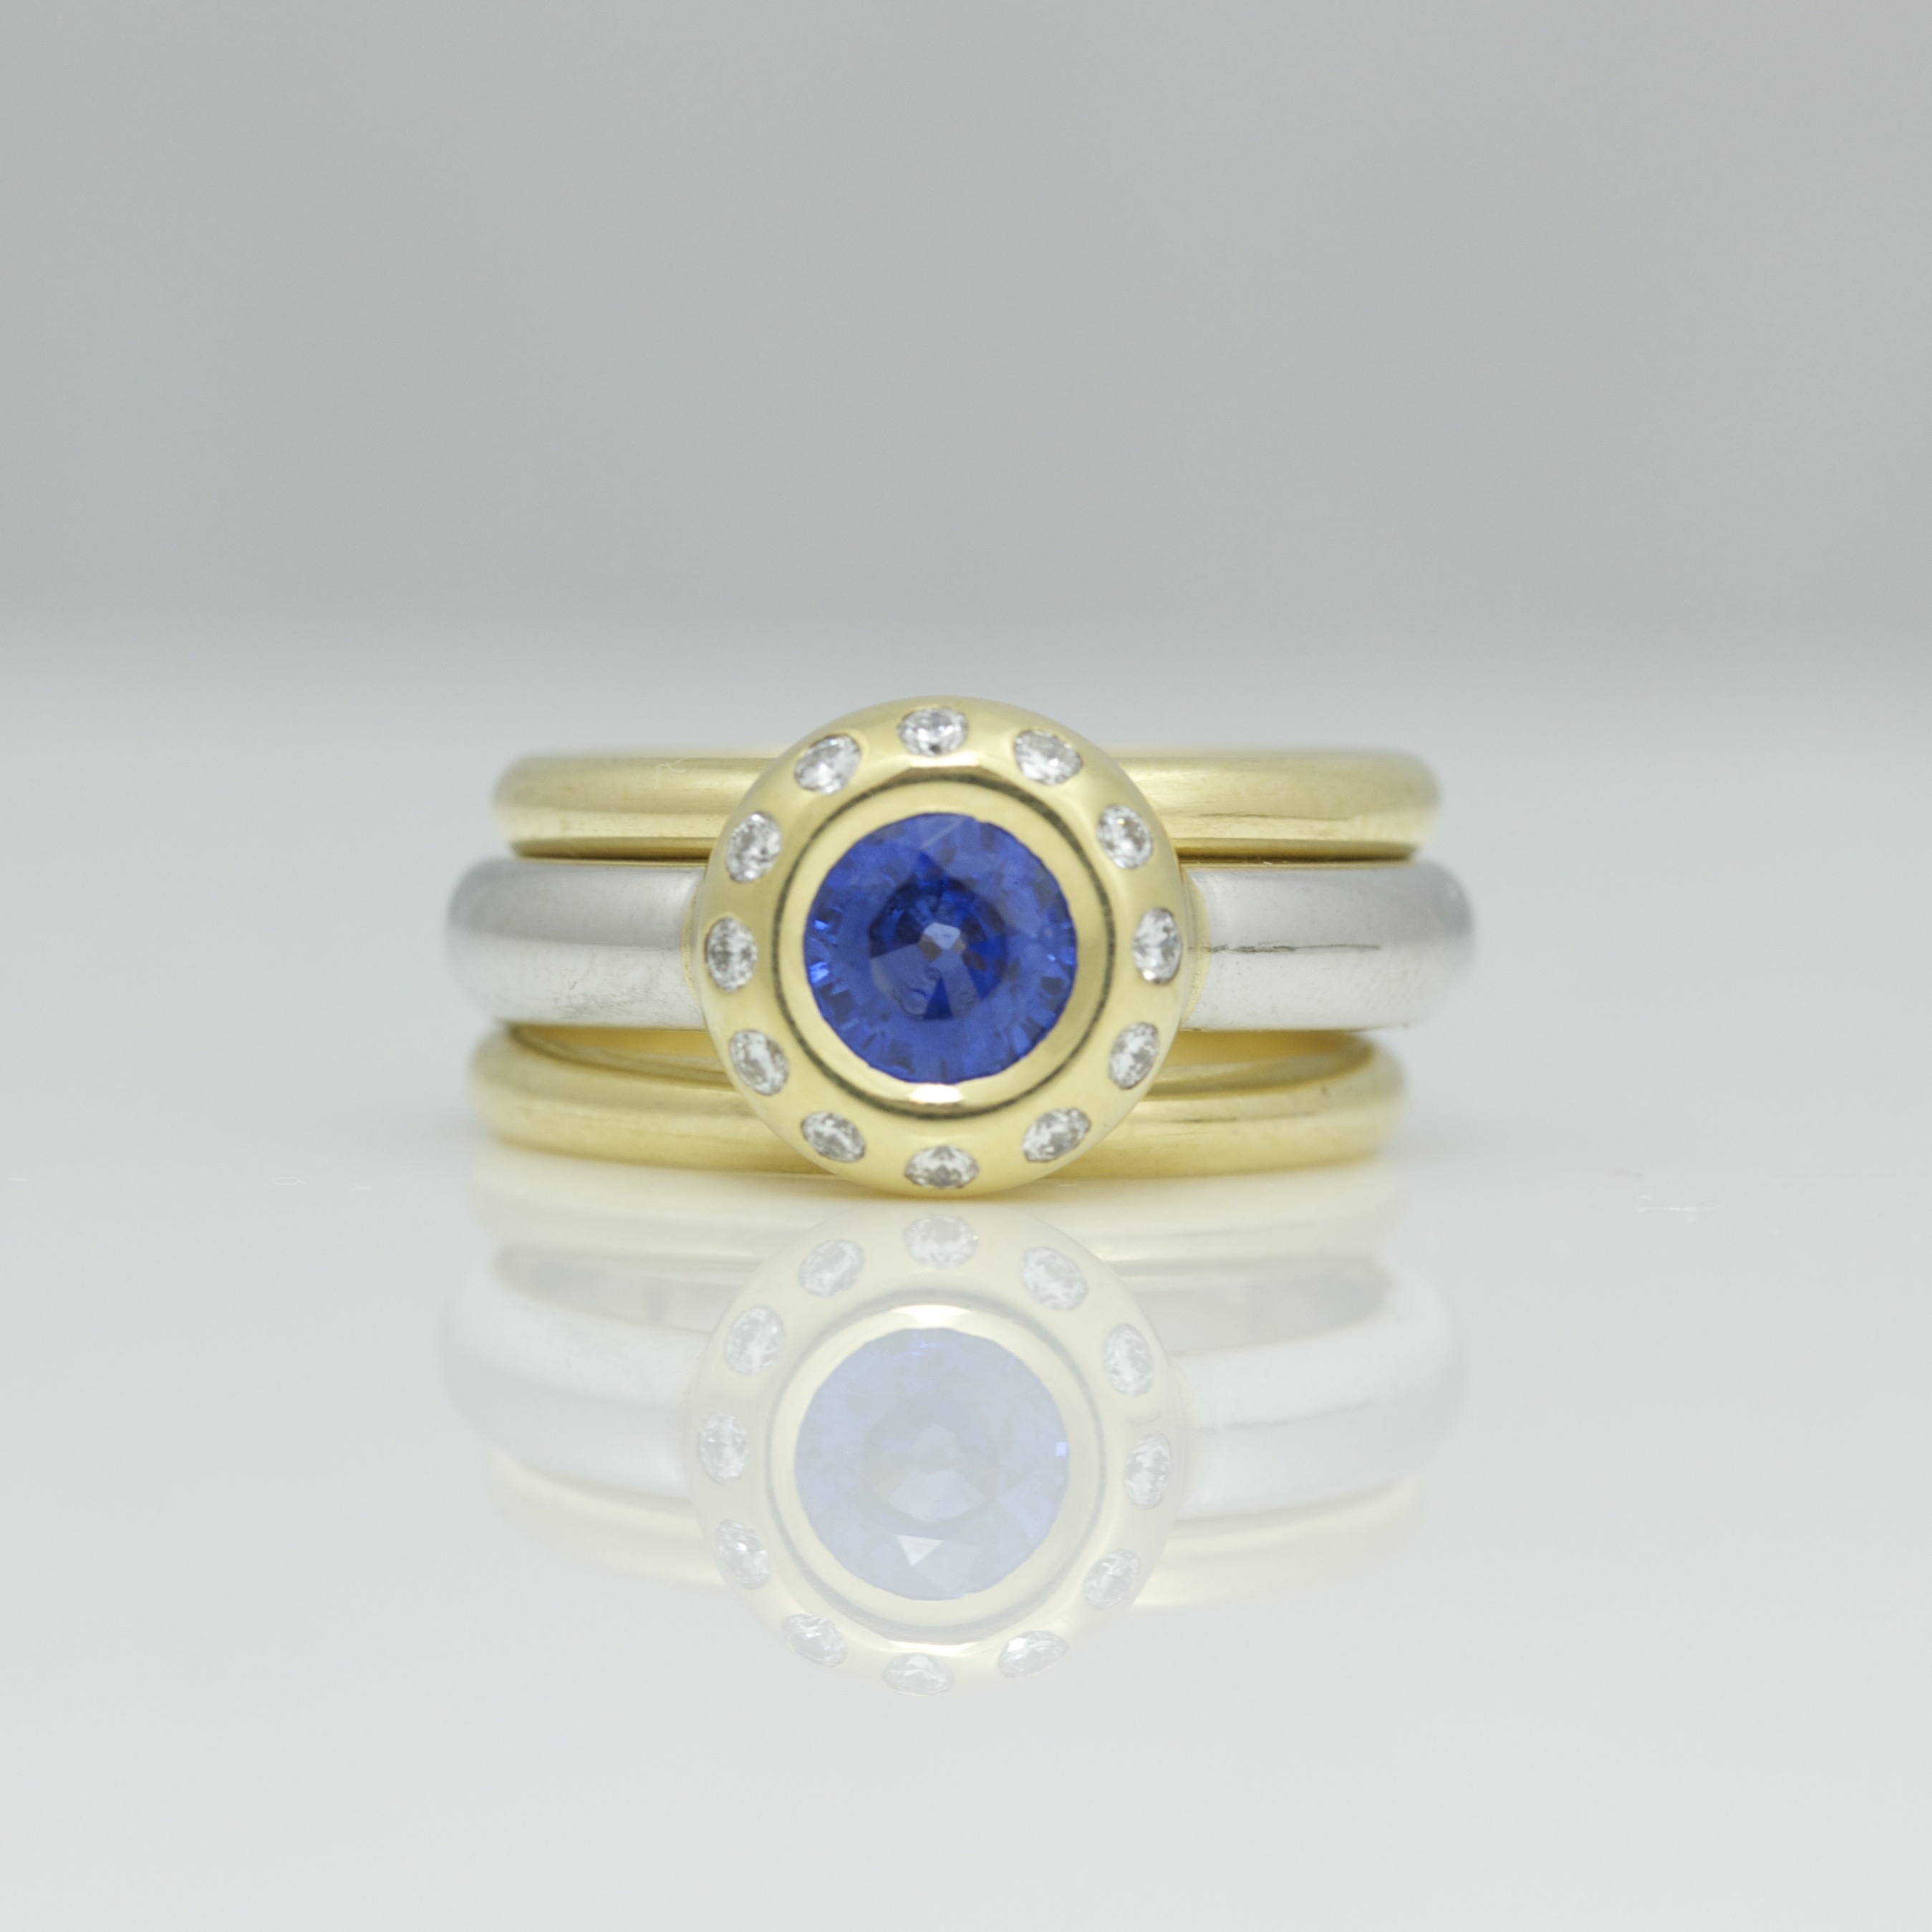 4db8a4418e824 Sapphire & diamond diamond rub-over set in 18ct yellow gold & platinum ring